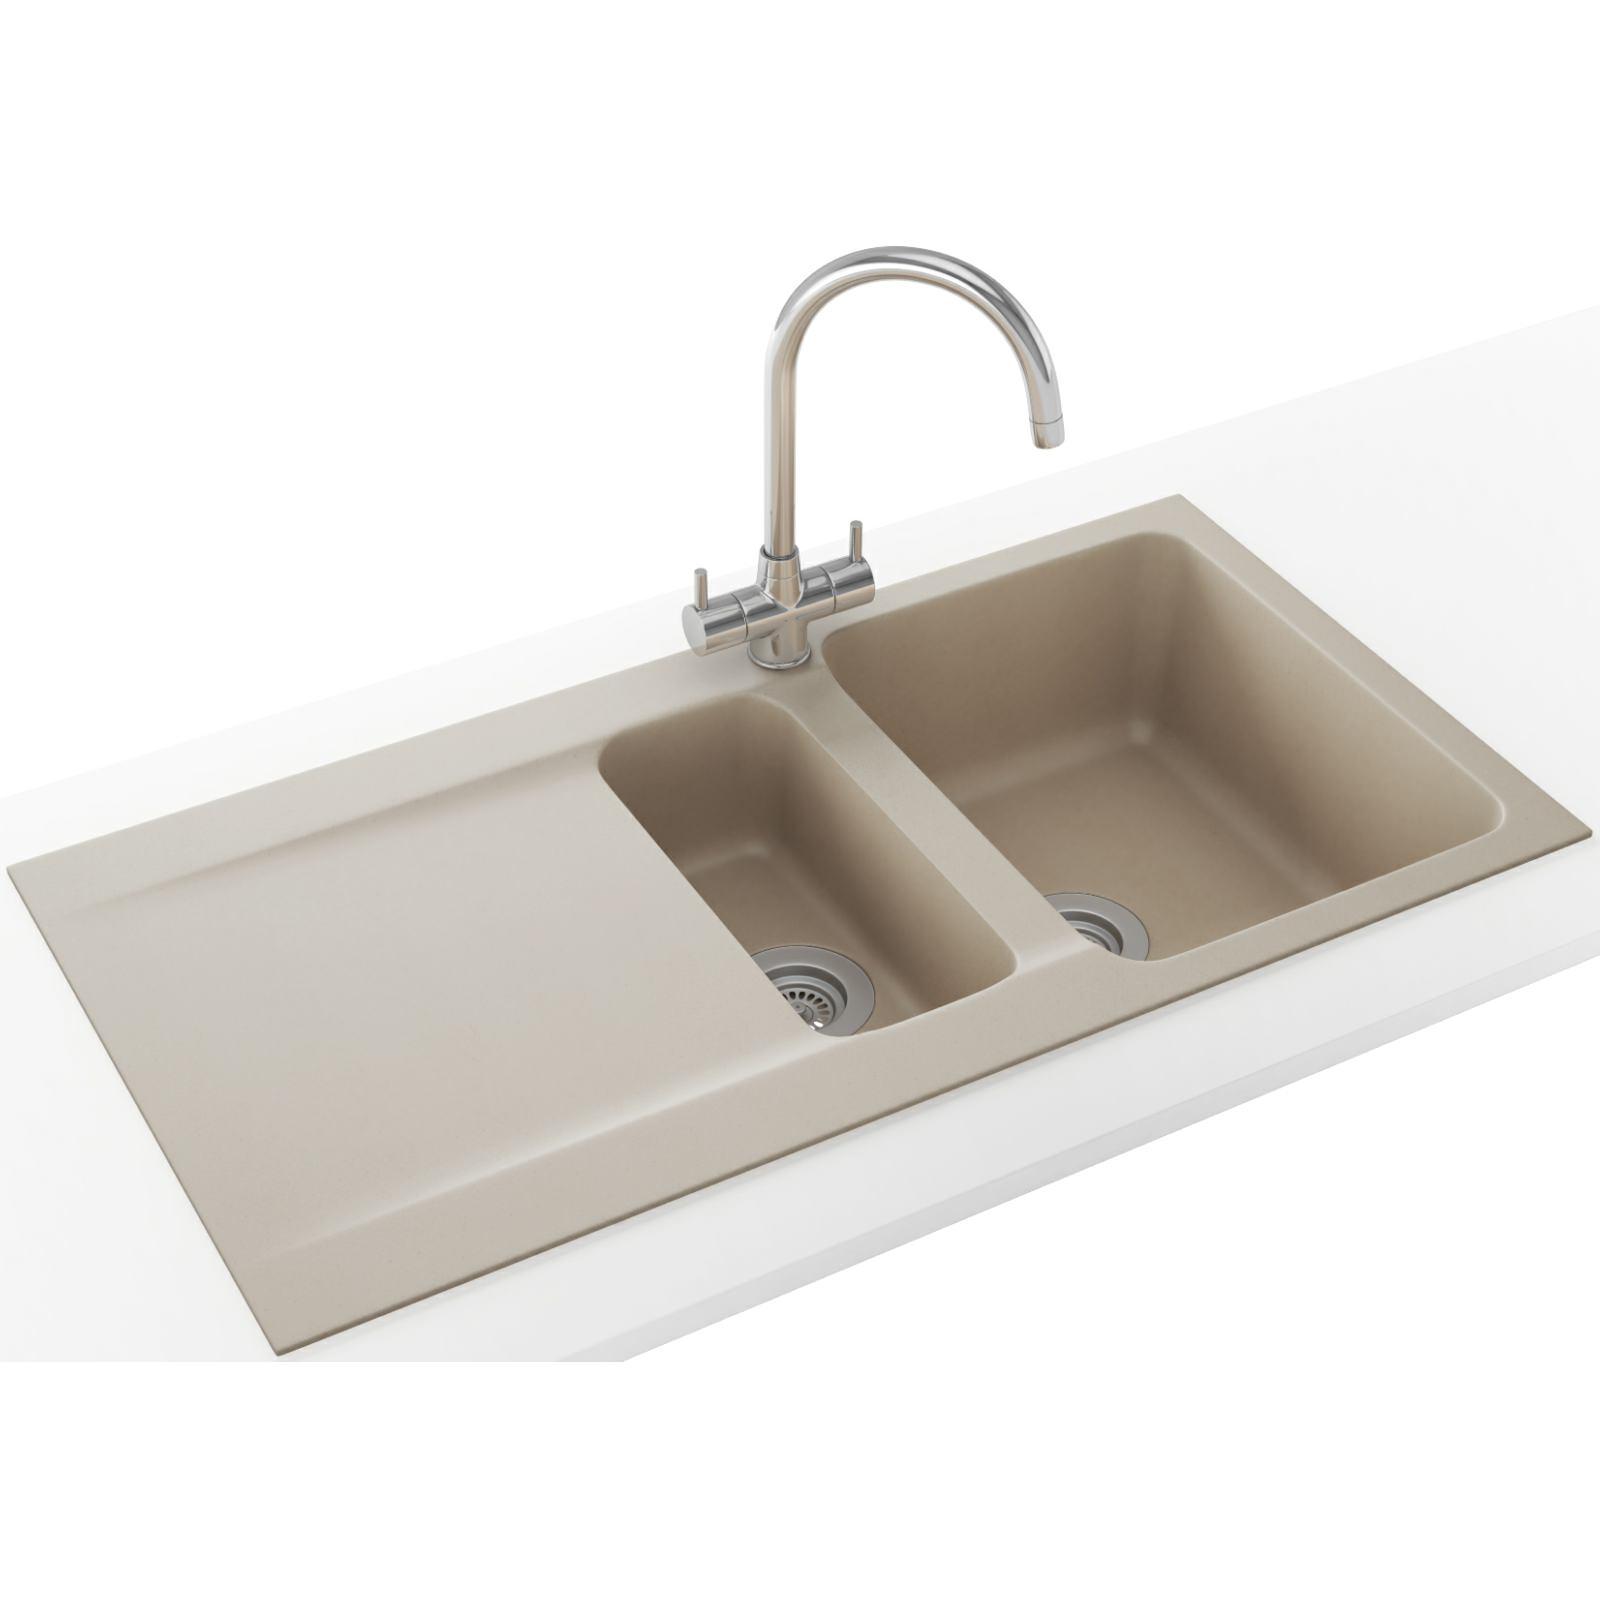 Franke Linen Finish Sinks : Franke Orion OID 651 Tectonite Coffee 1.5 Bowl Inset Sink 114.0316 ...